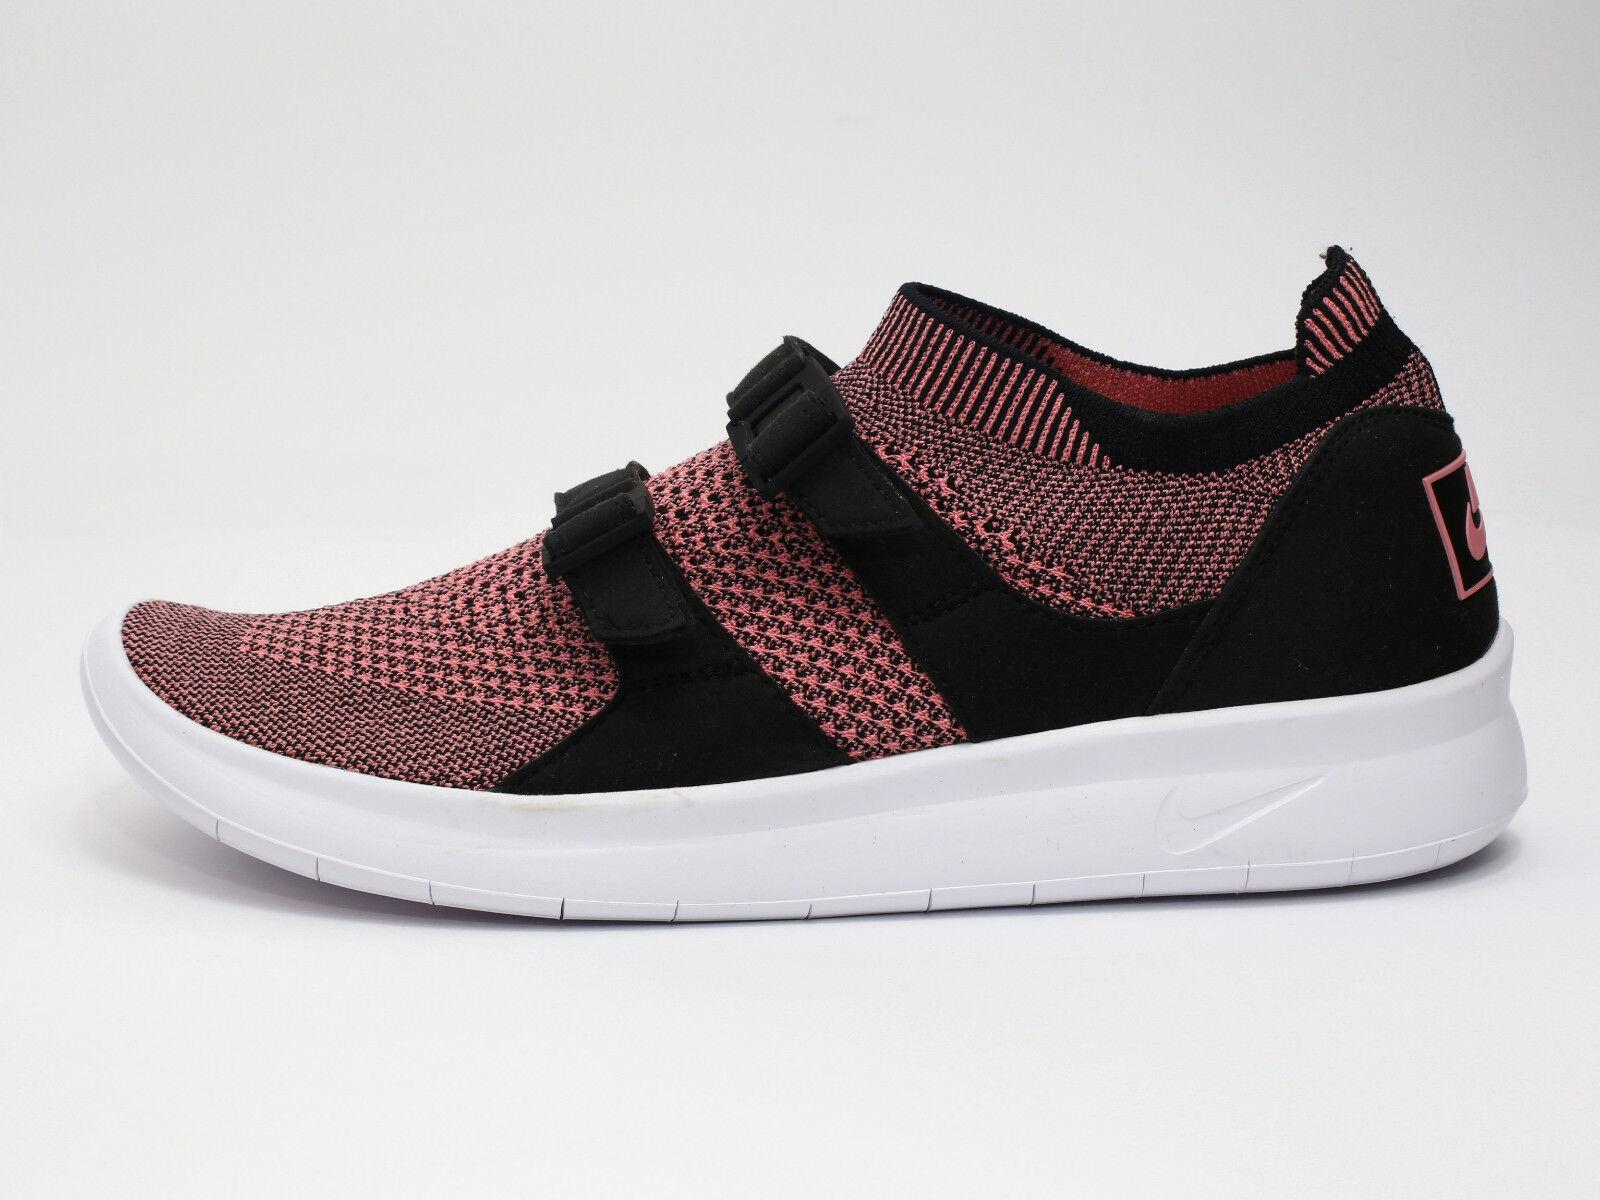 Nike Air sockracer flyknit (898022-003) calcetines cortos-talla 45-rojo-nuevo (s)